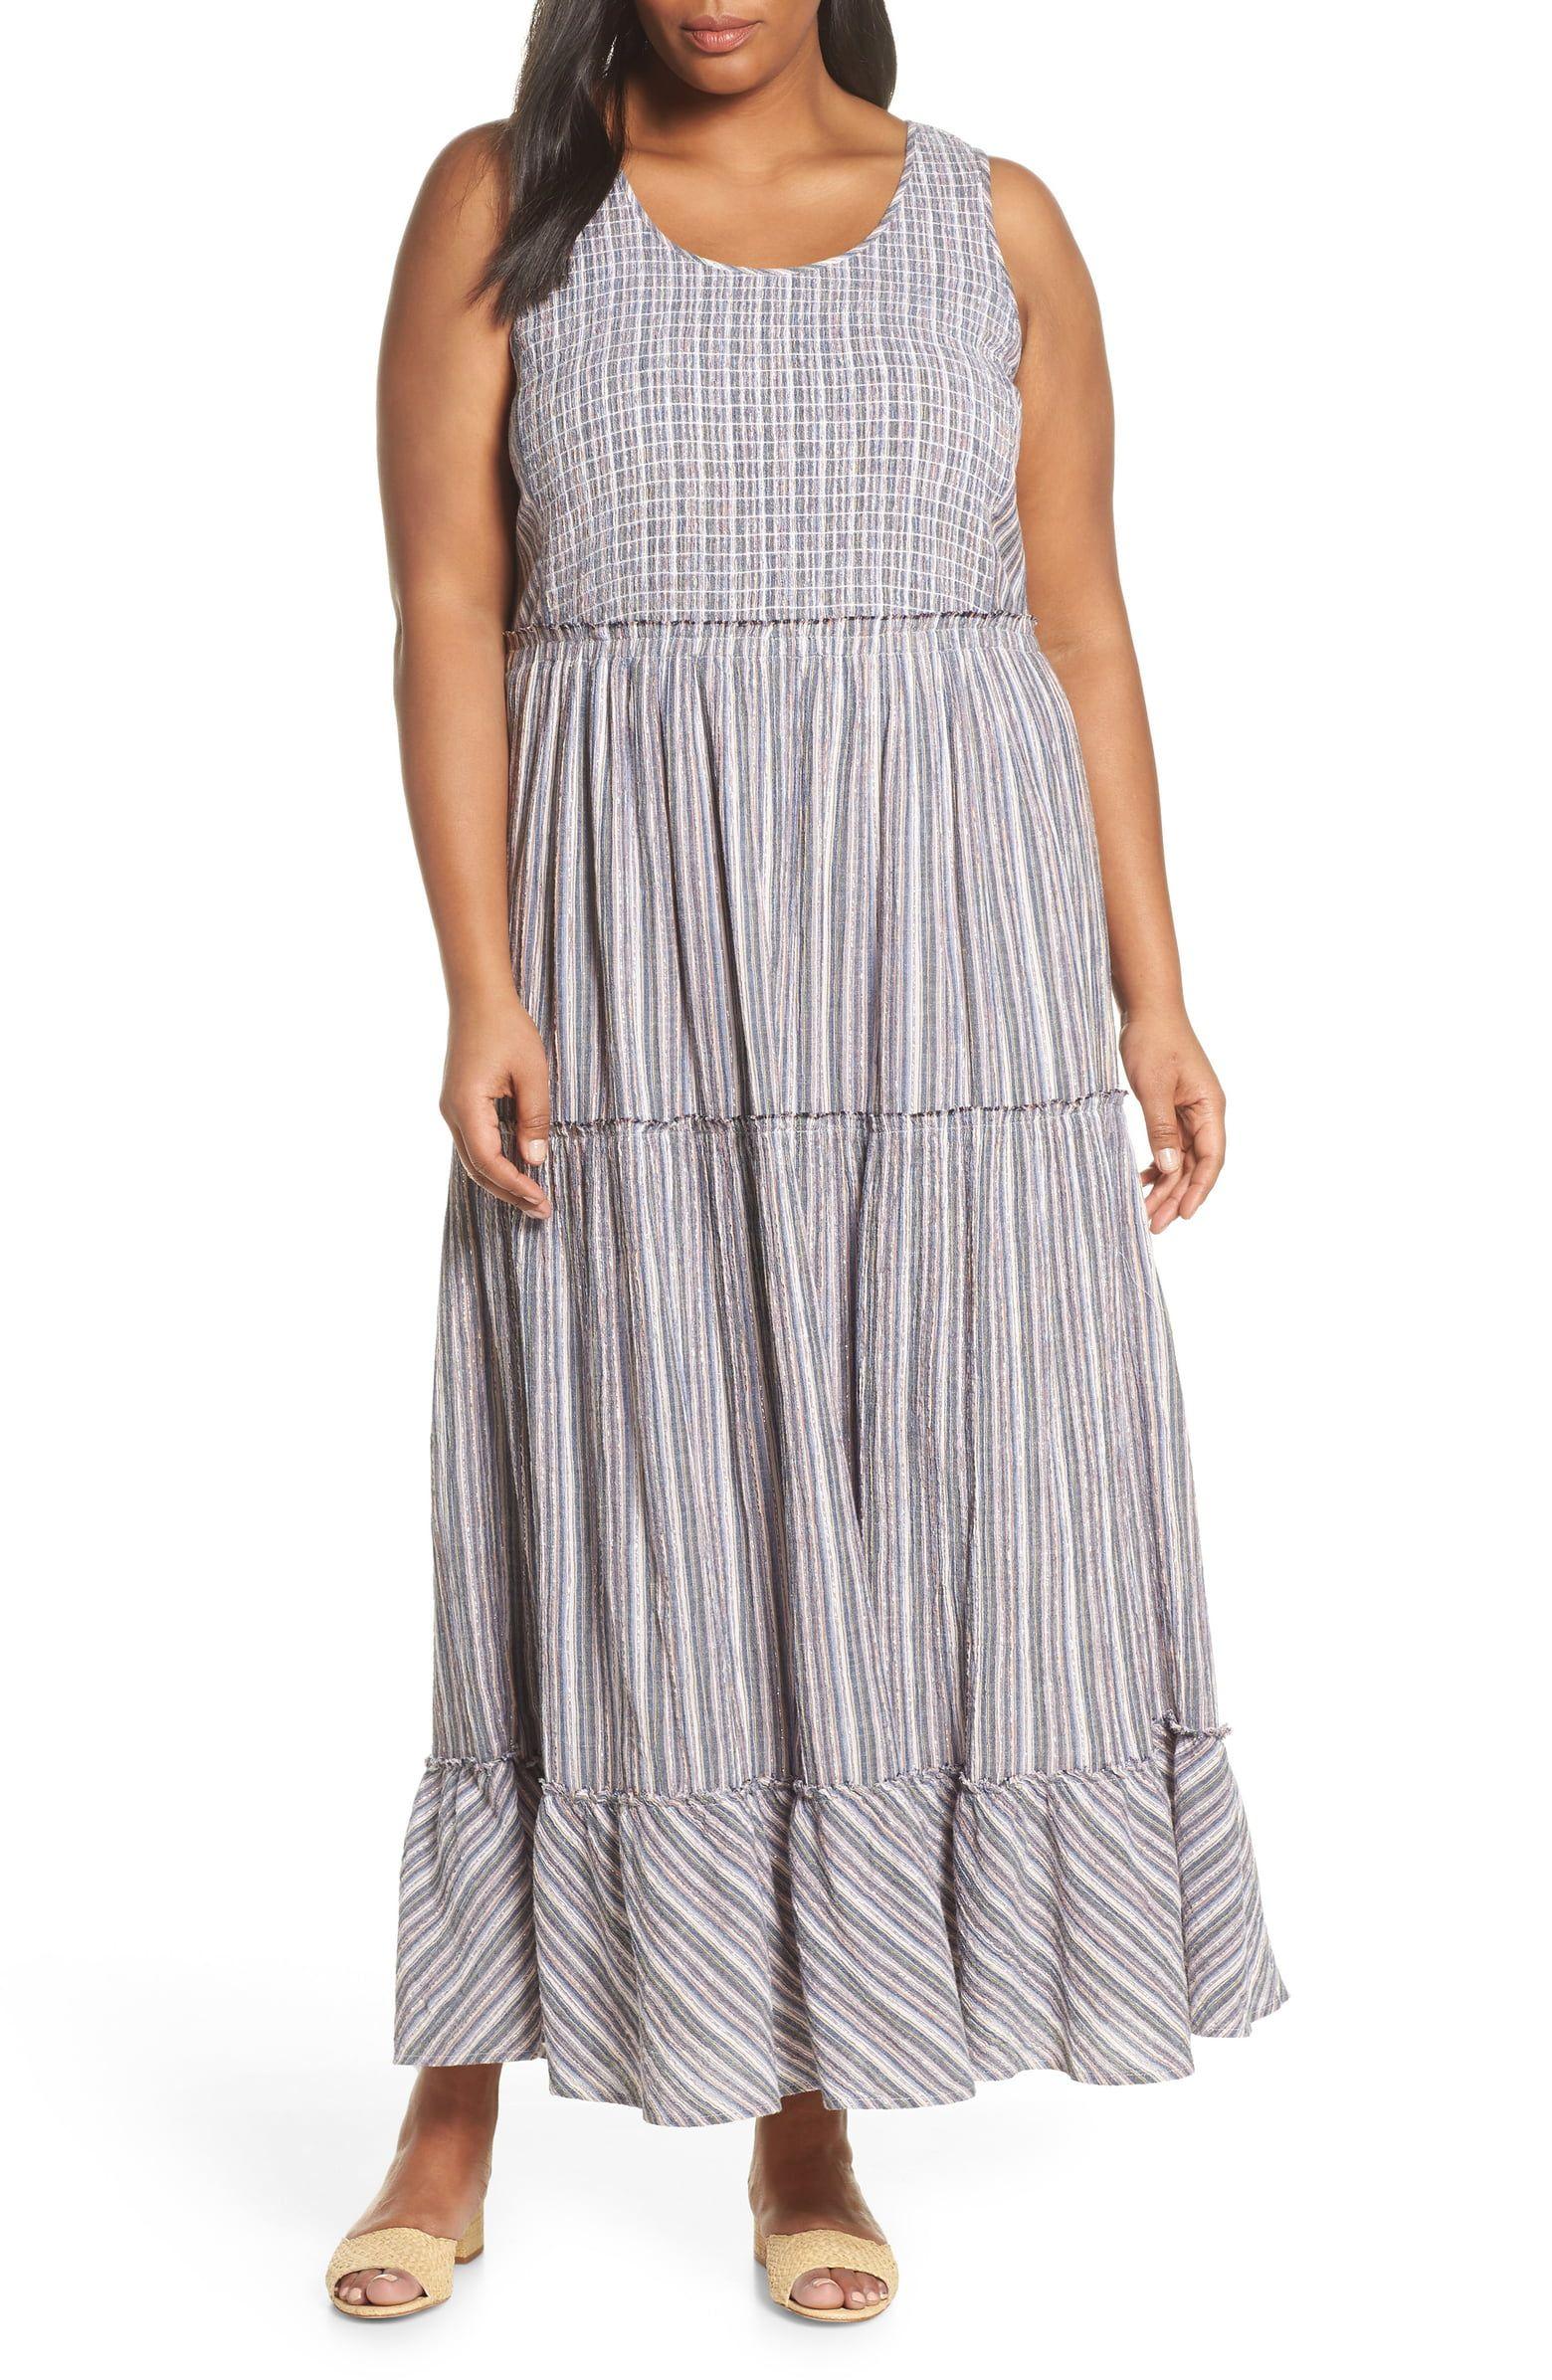 Caslon Tiered Smocked Maxi Dress Regular Petite Plus Size Nordstrom Maxi Dress Smocked Maxi Dresses Dresses [ 2392 x 1560 Pixel ]